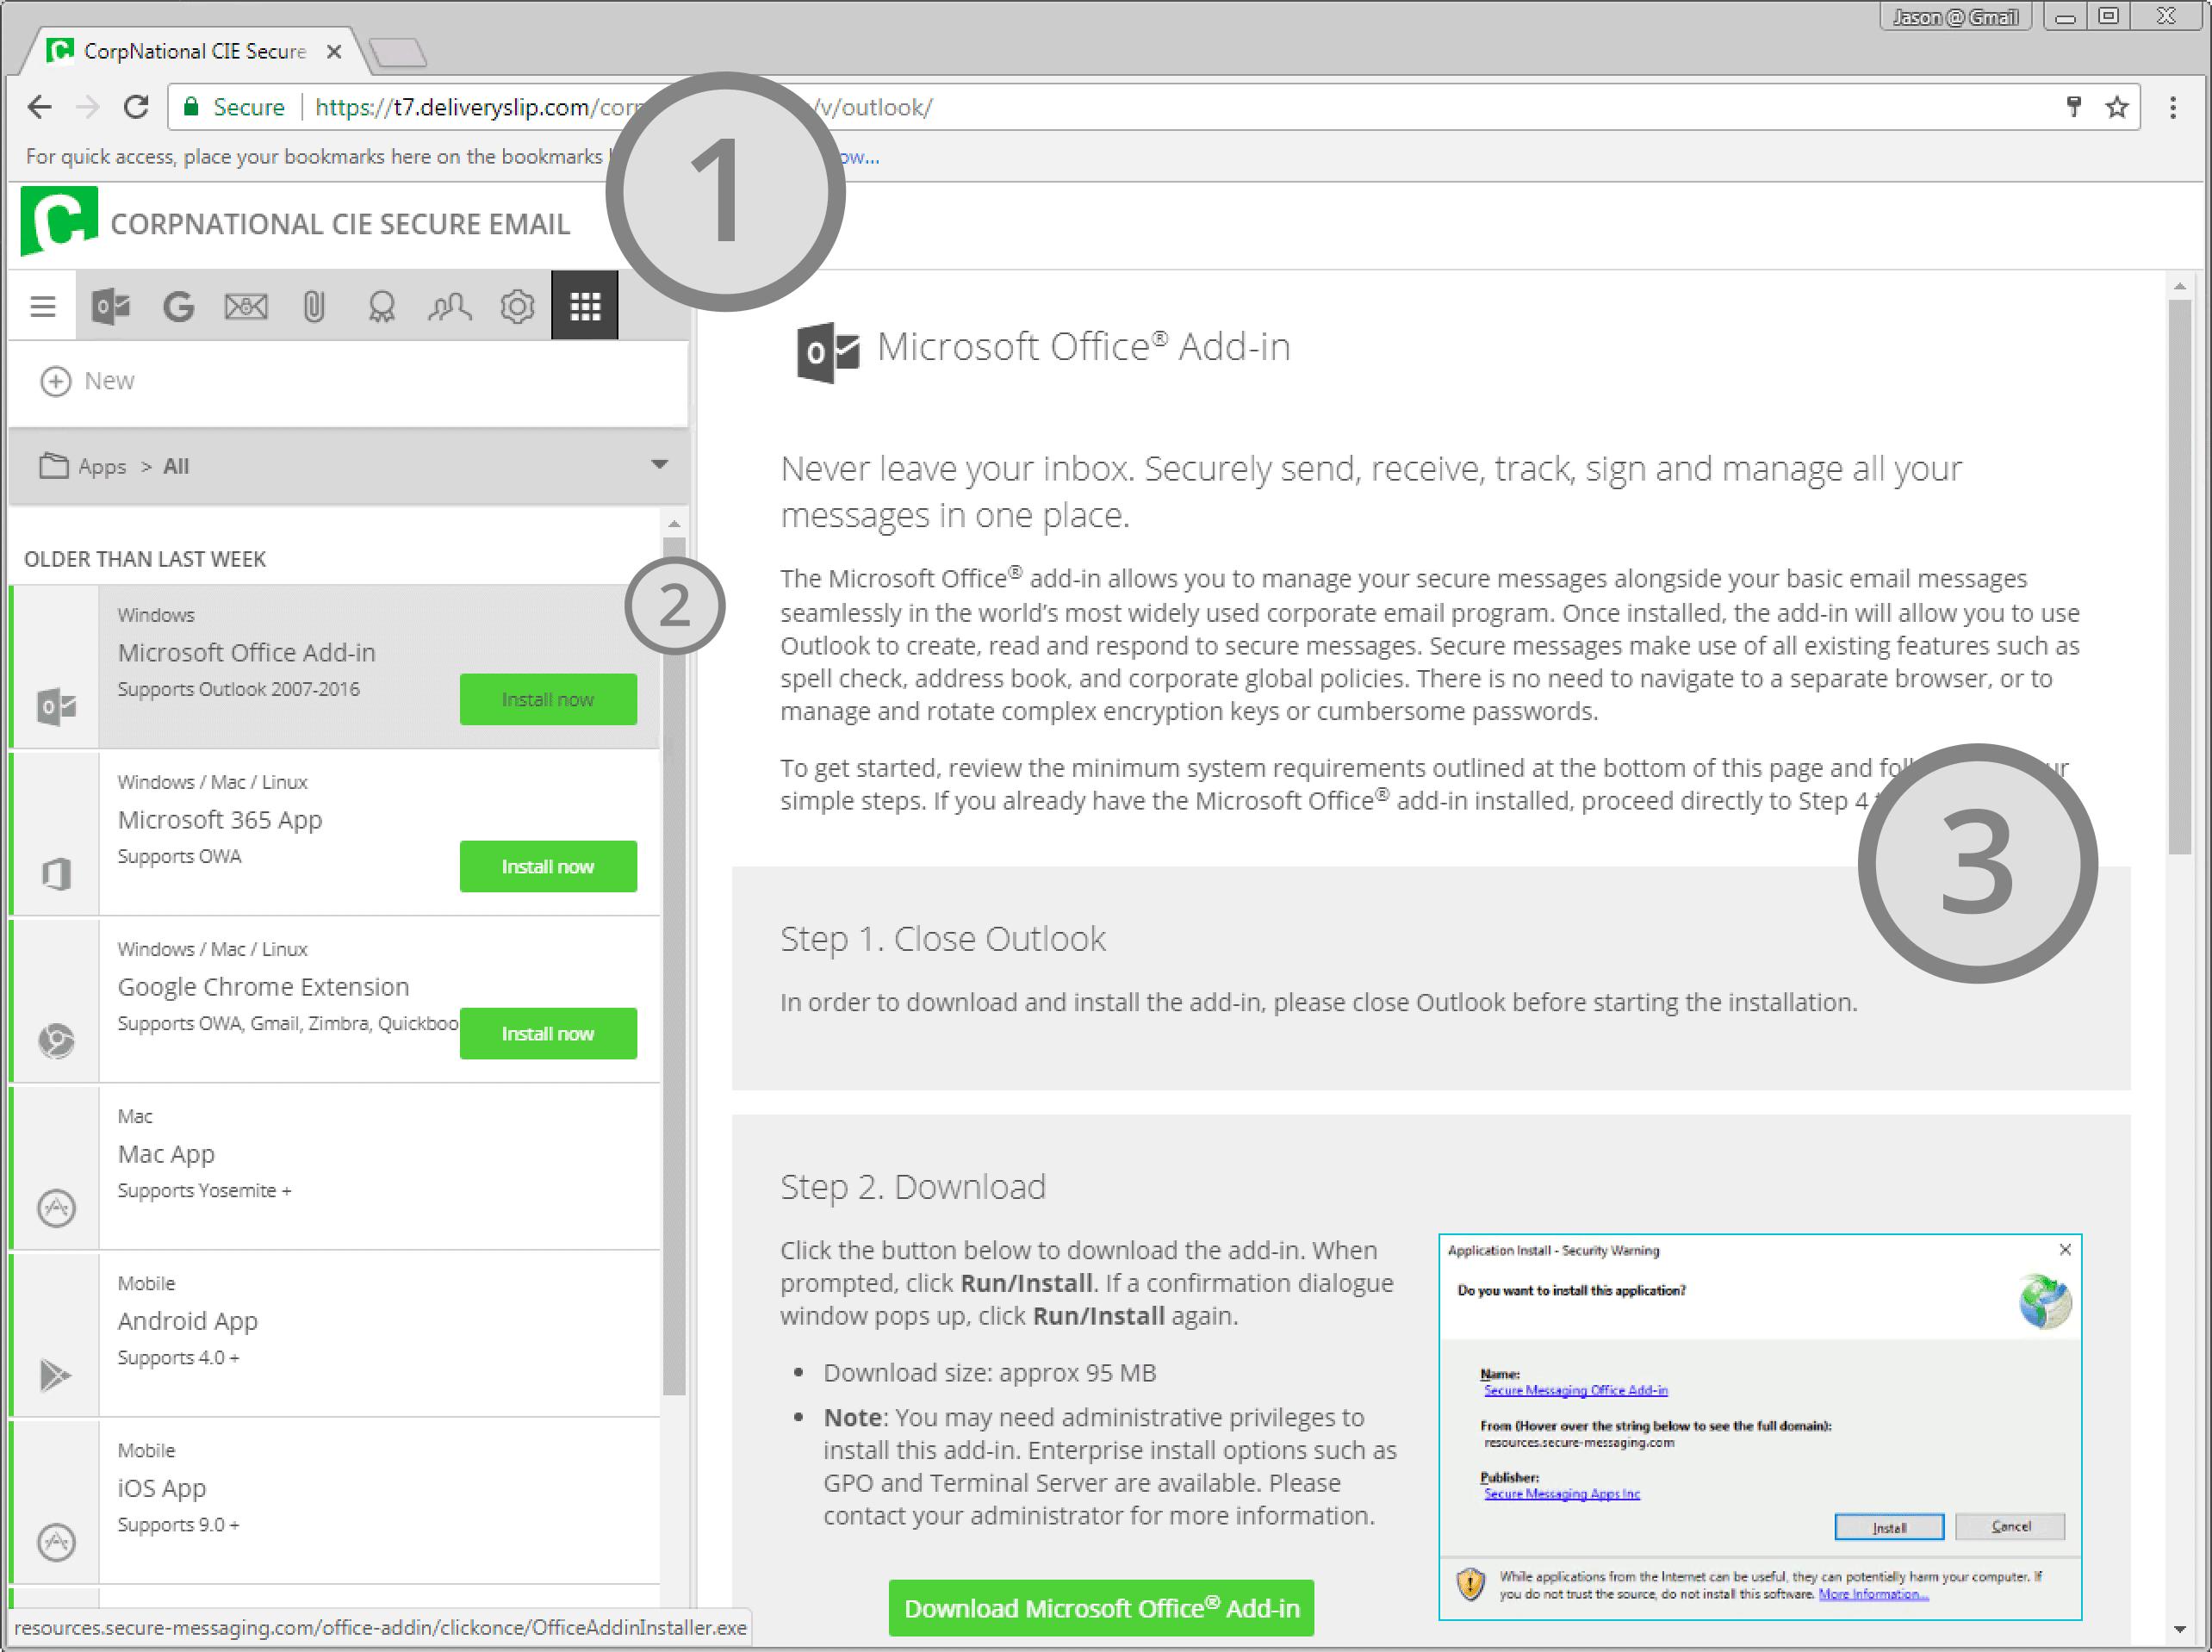 DeliverySlip Software - DeliverySlip Microsoft Office add-in